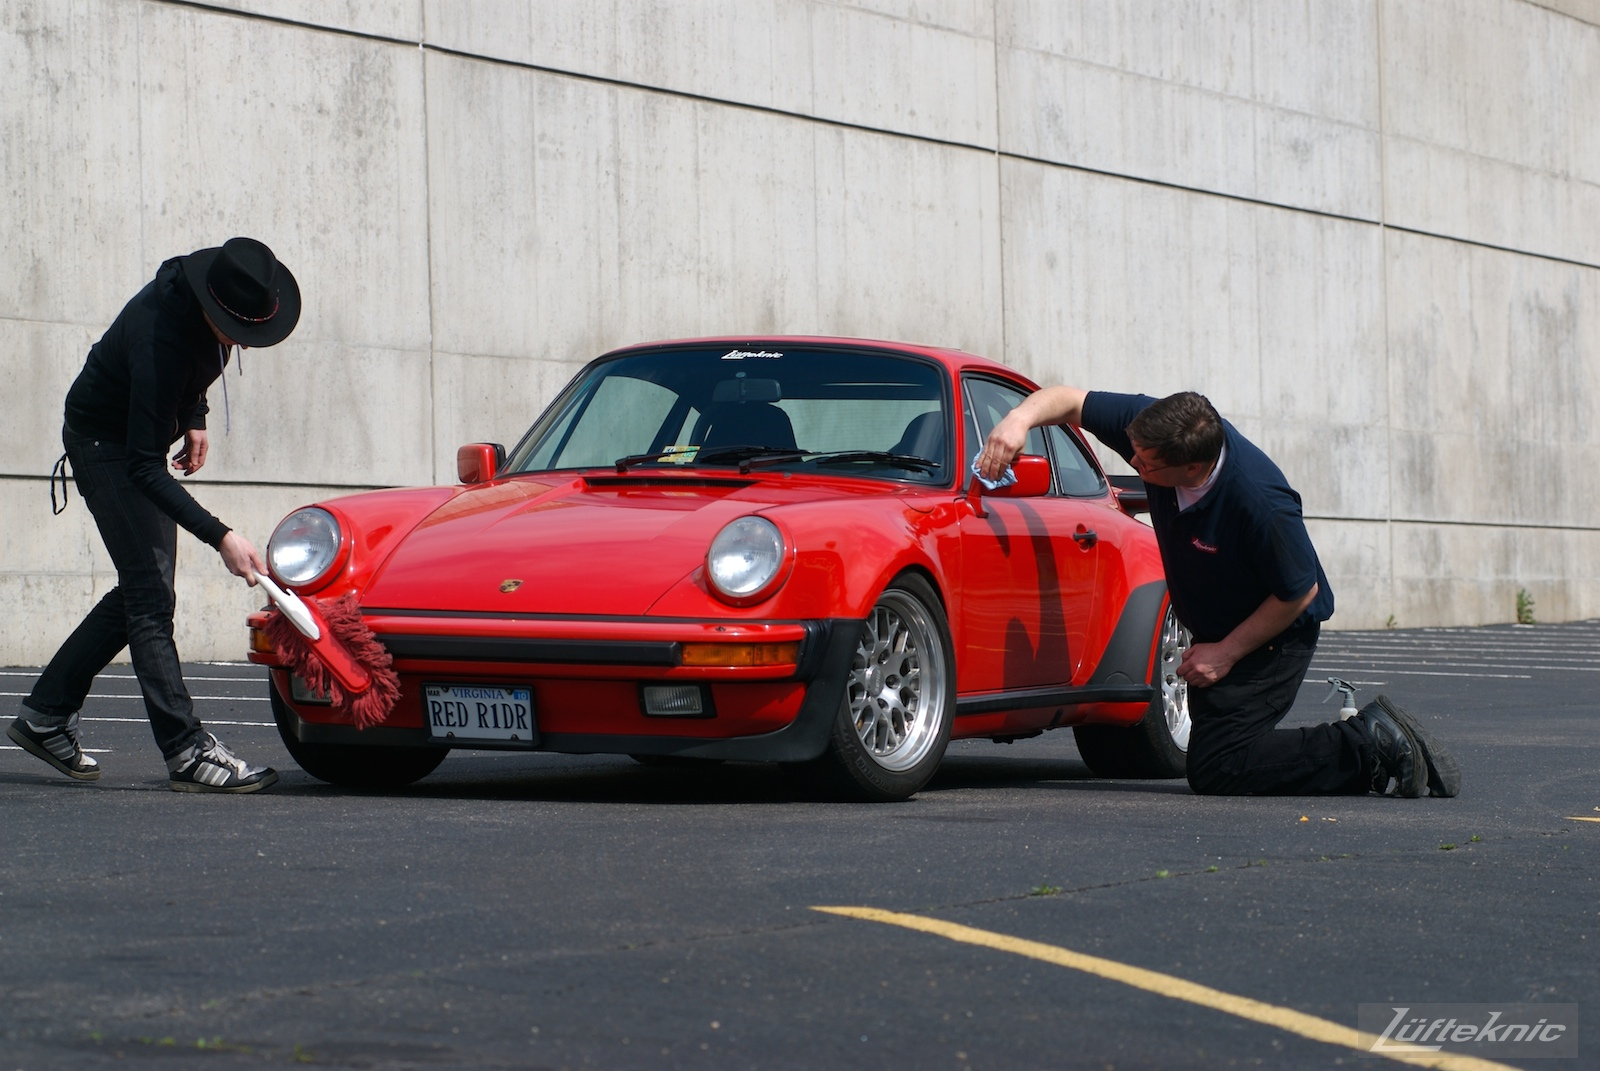 Red Porsche 930 Turbo being detailed.